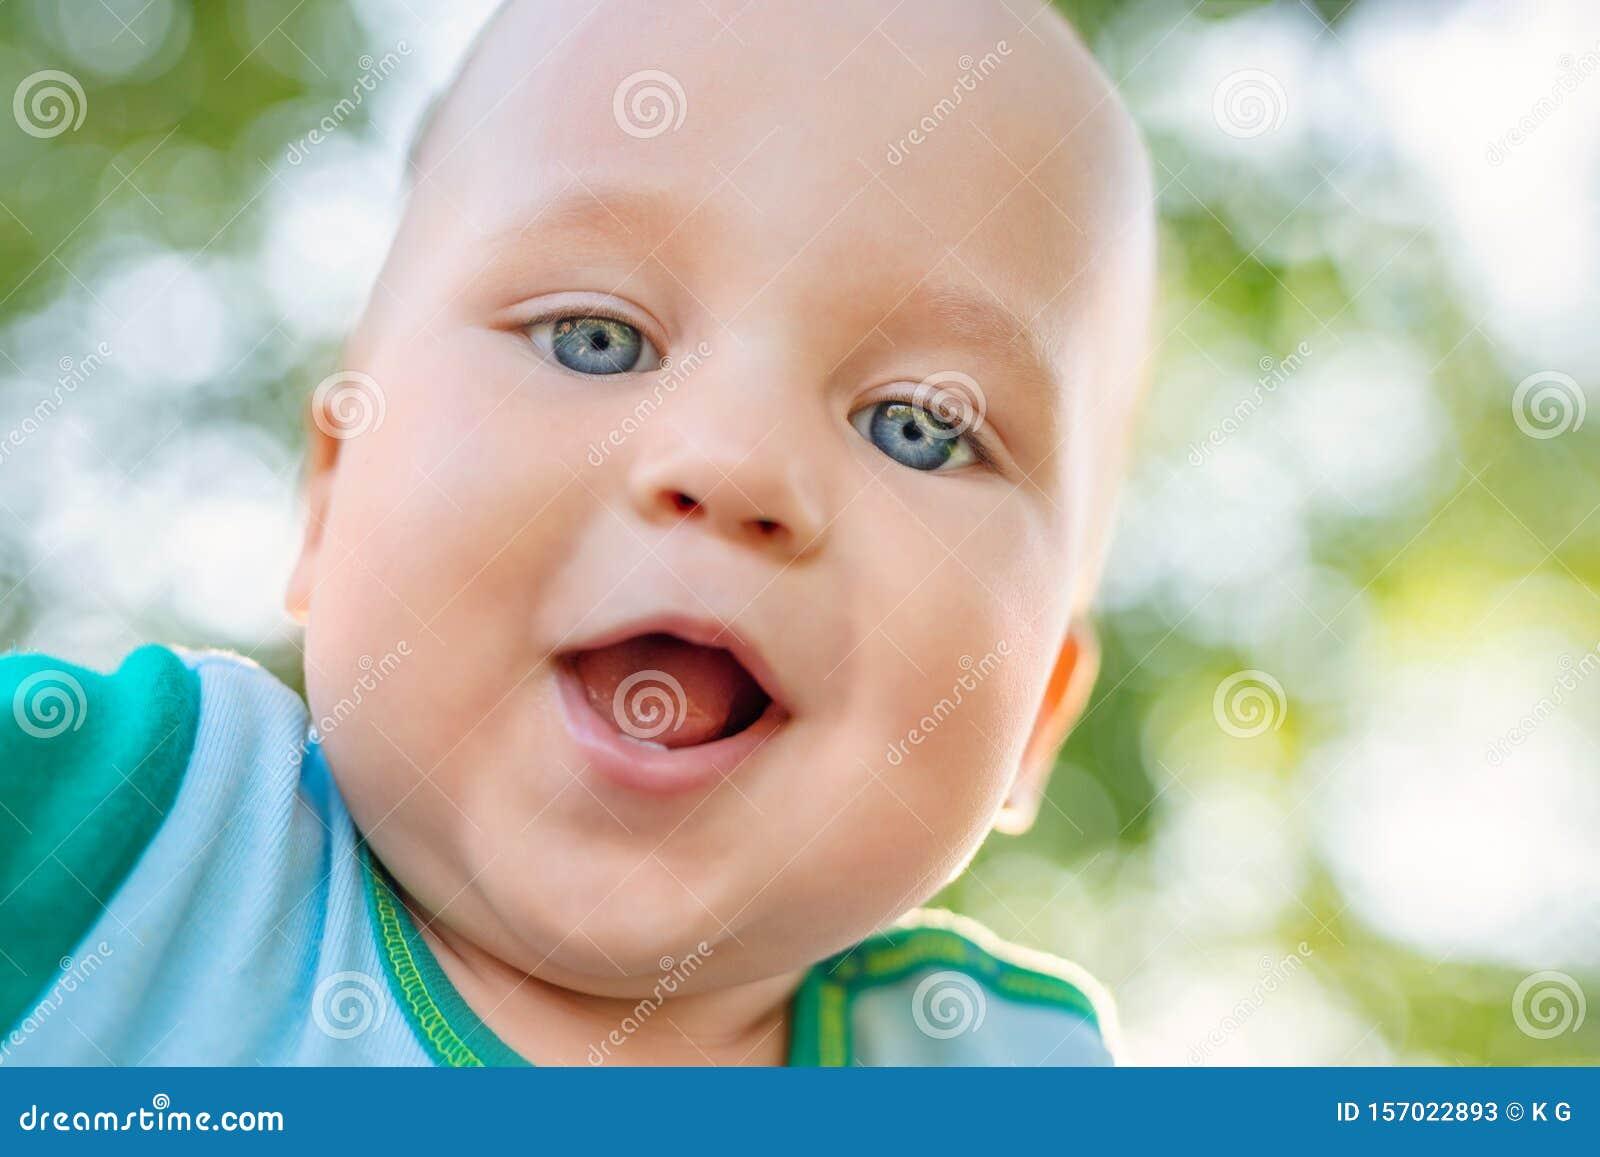 Close-up portrait of cute adorable caucasian blond toddler boy having fun in park or garden outdoors. Close selfie portrait of